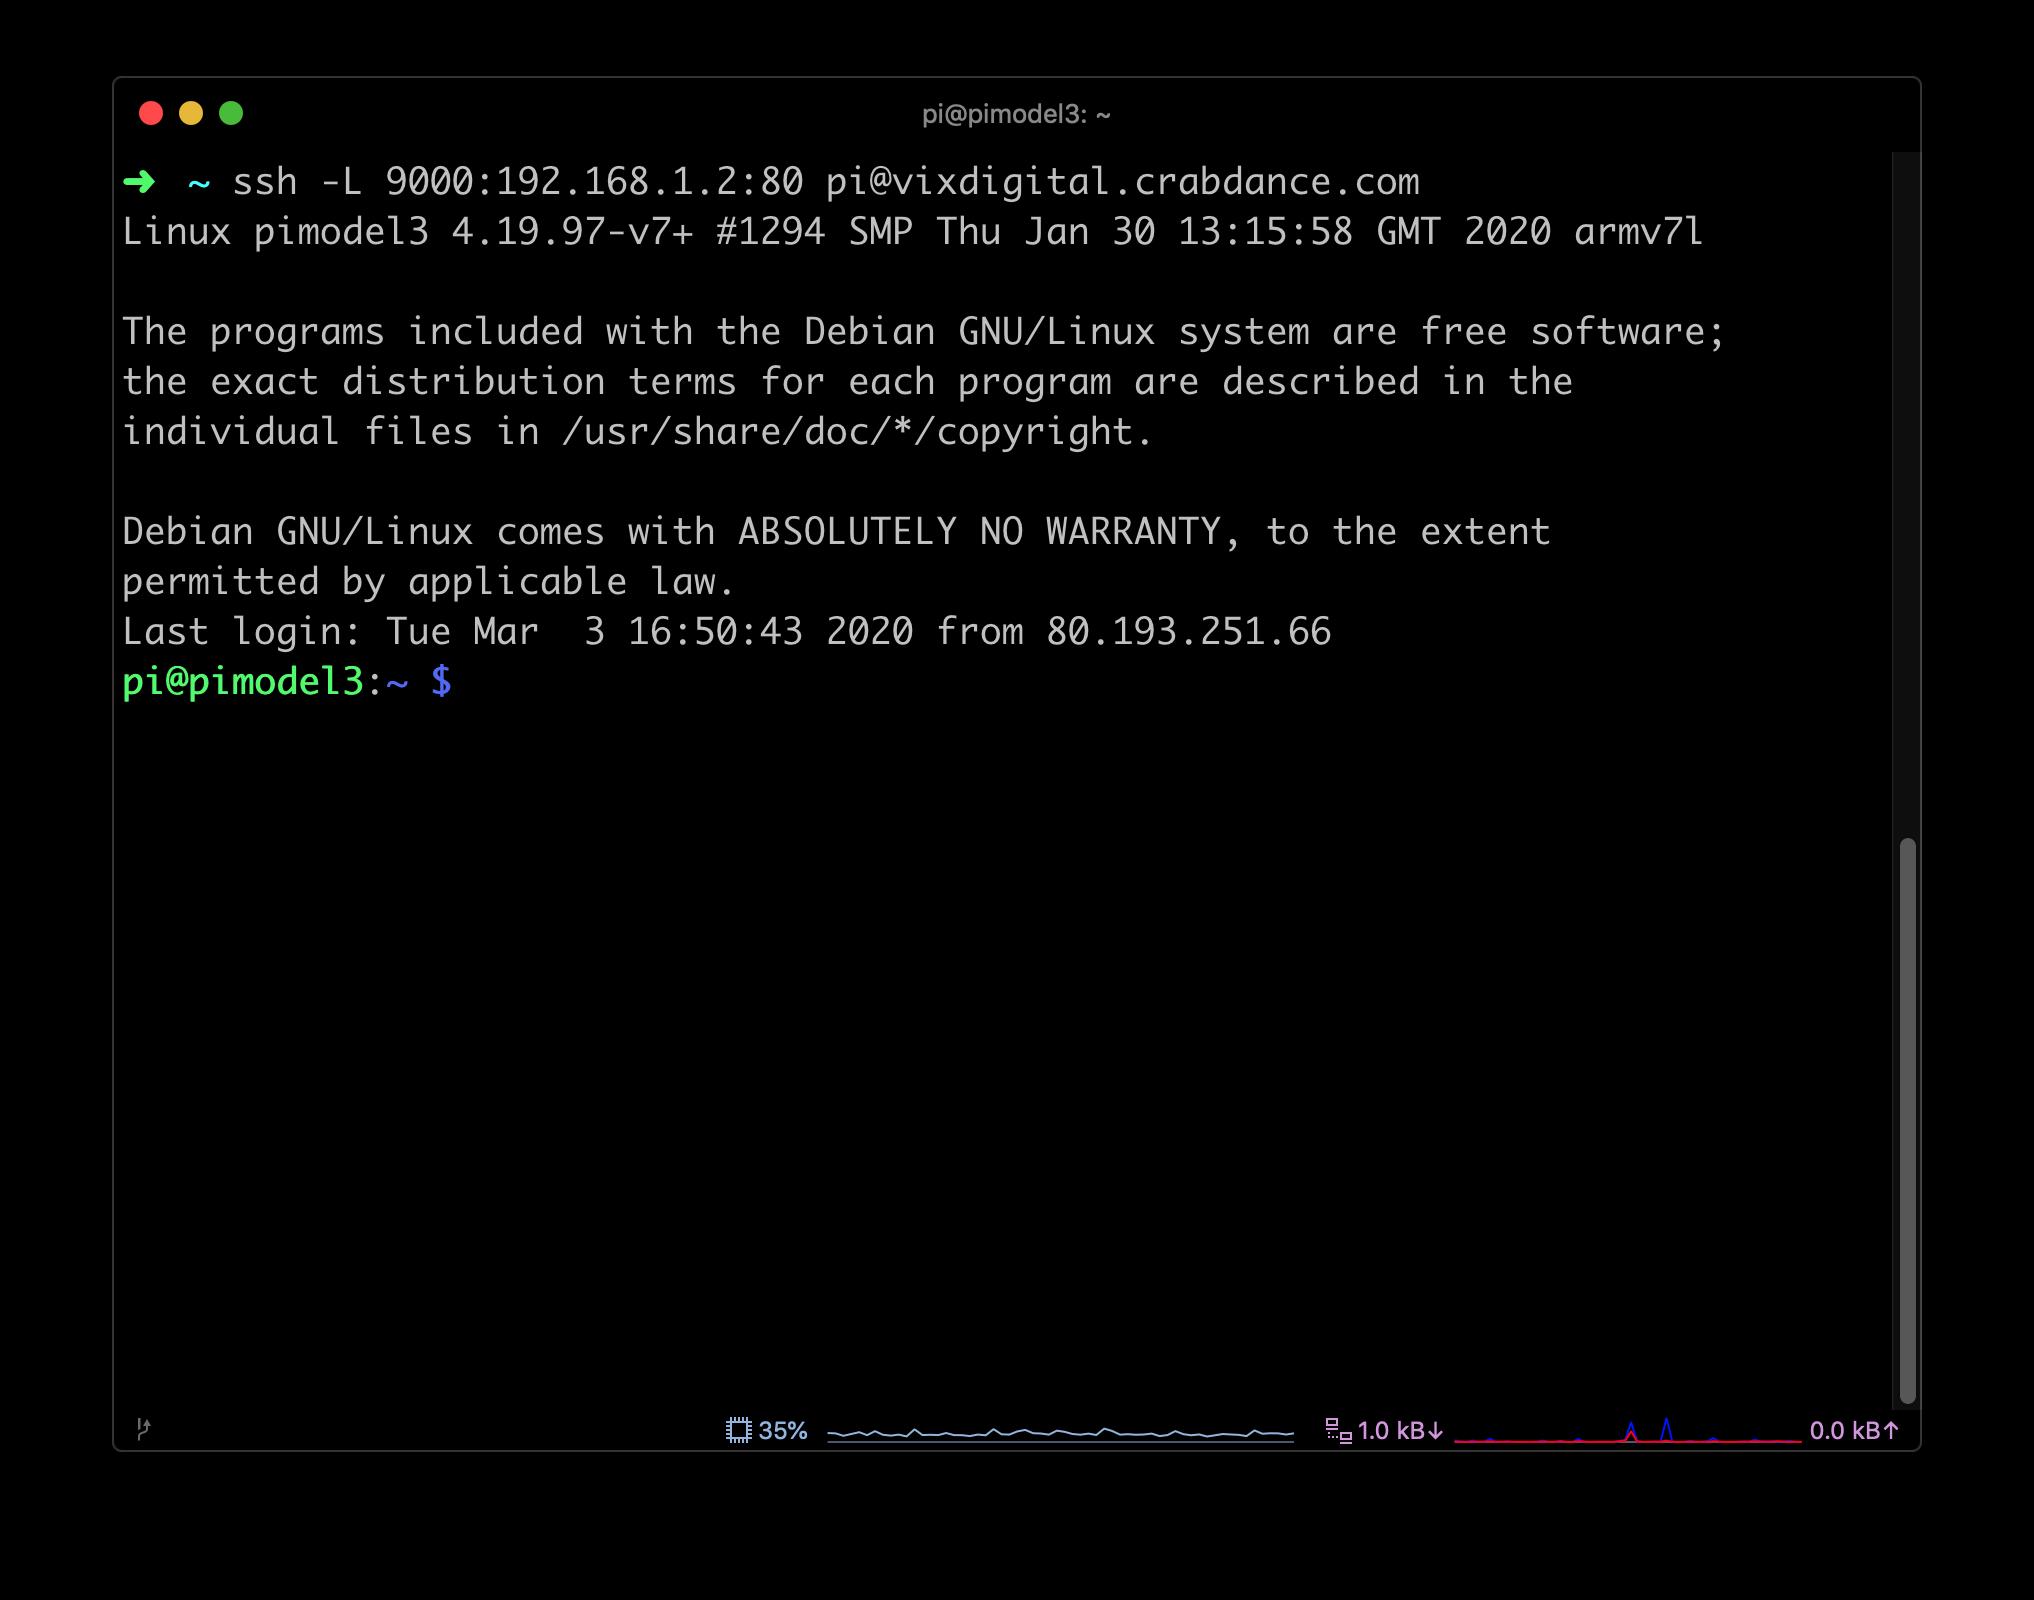 https://s3-us-west-2.amazonaws.com/secure.notion-static.com/3399fb64-8e97-4b94-bf71-264dfe6c8c8b/Screenshot_2020-03-03_at_16.51.20.png